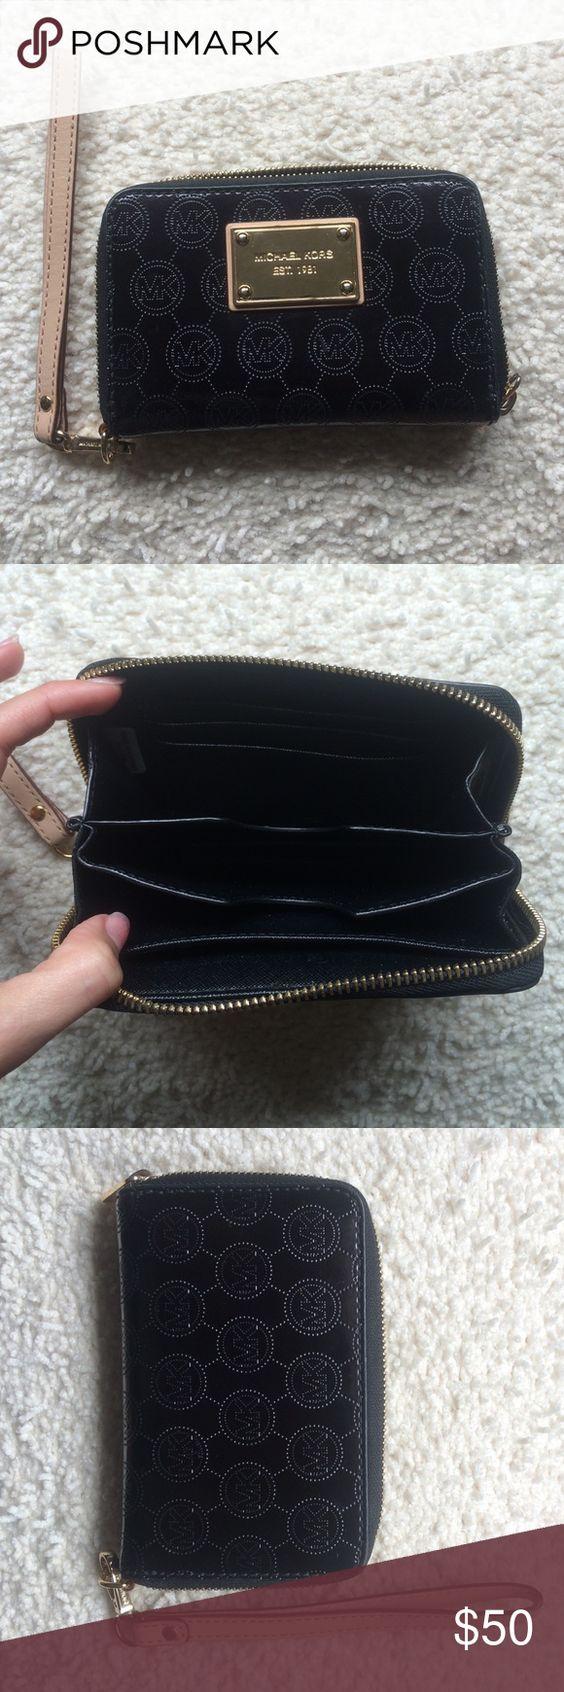 ❤️Michael Kors Wallet Wristlet Never worn MK wallet wristlet Michael Kors Bags Clutches & Wristlets